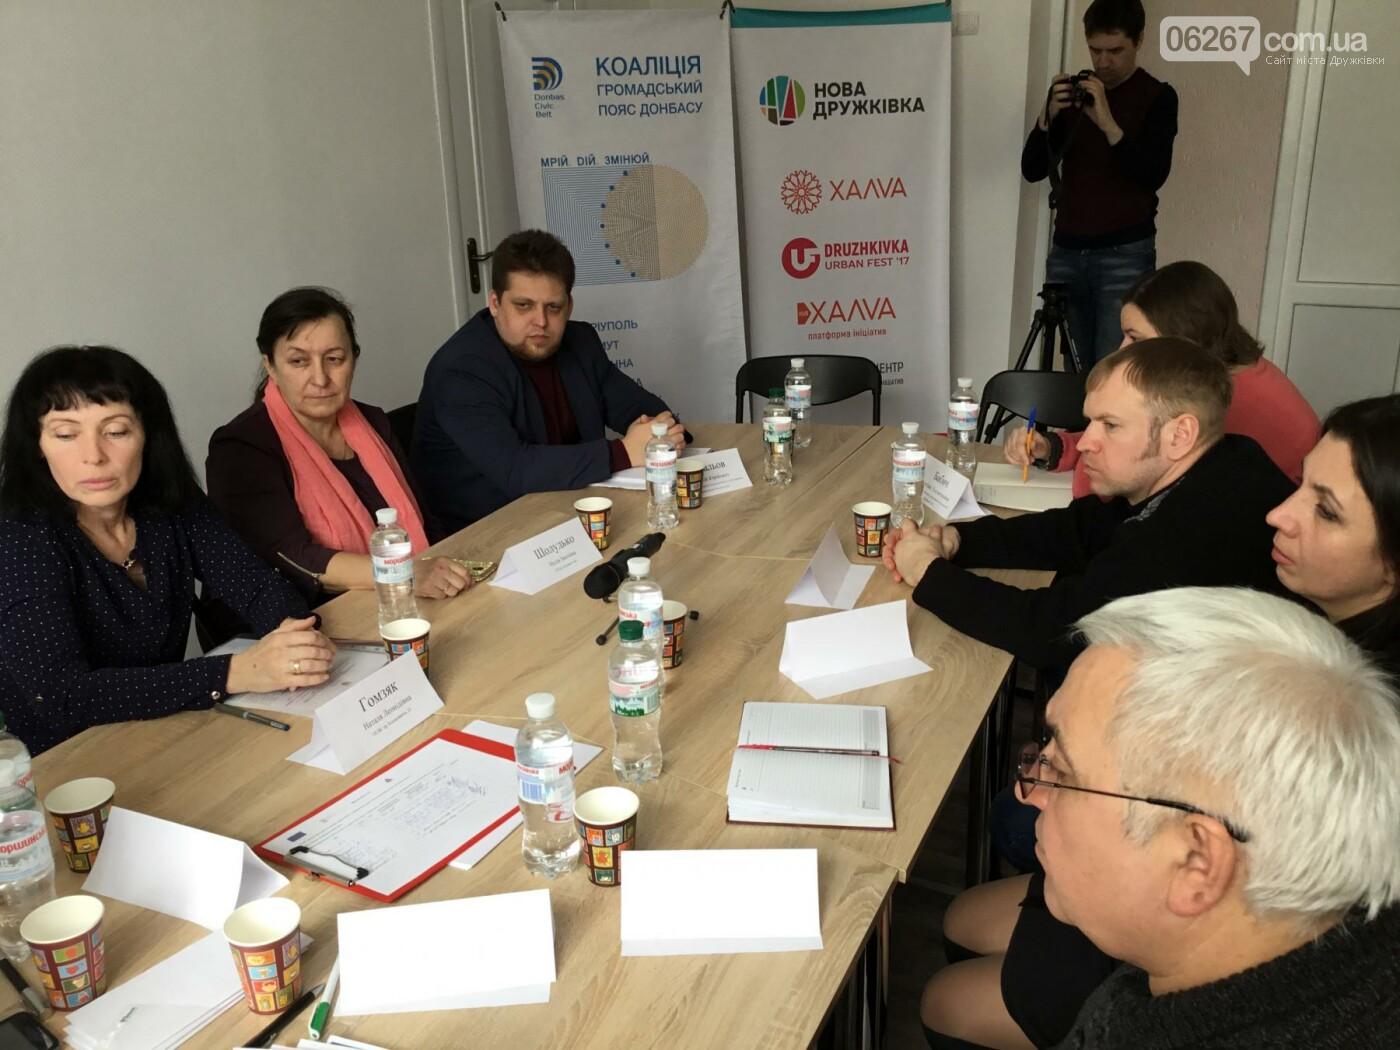 В Дружковке обсудили проблемы развития ОСМД в городе и области (ФОТО, ВИДЕО), фото-1